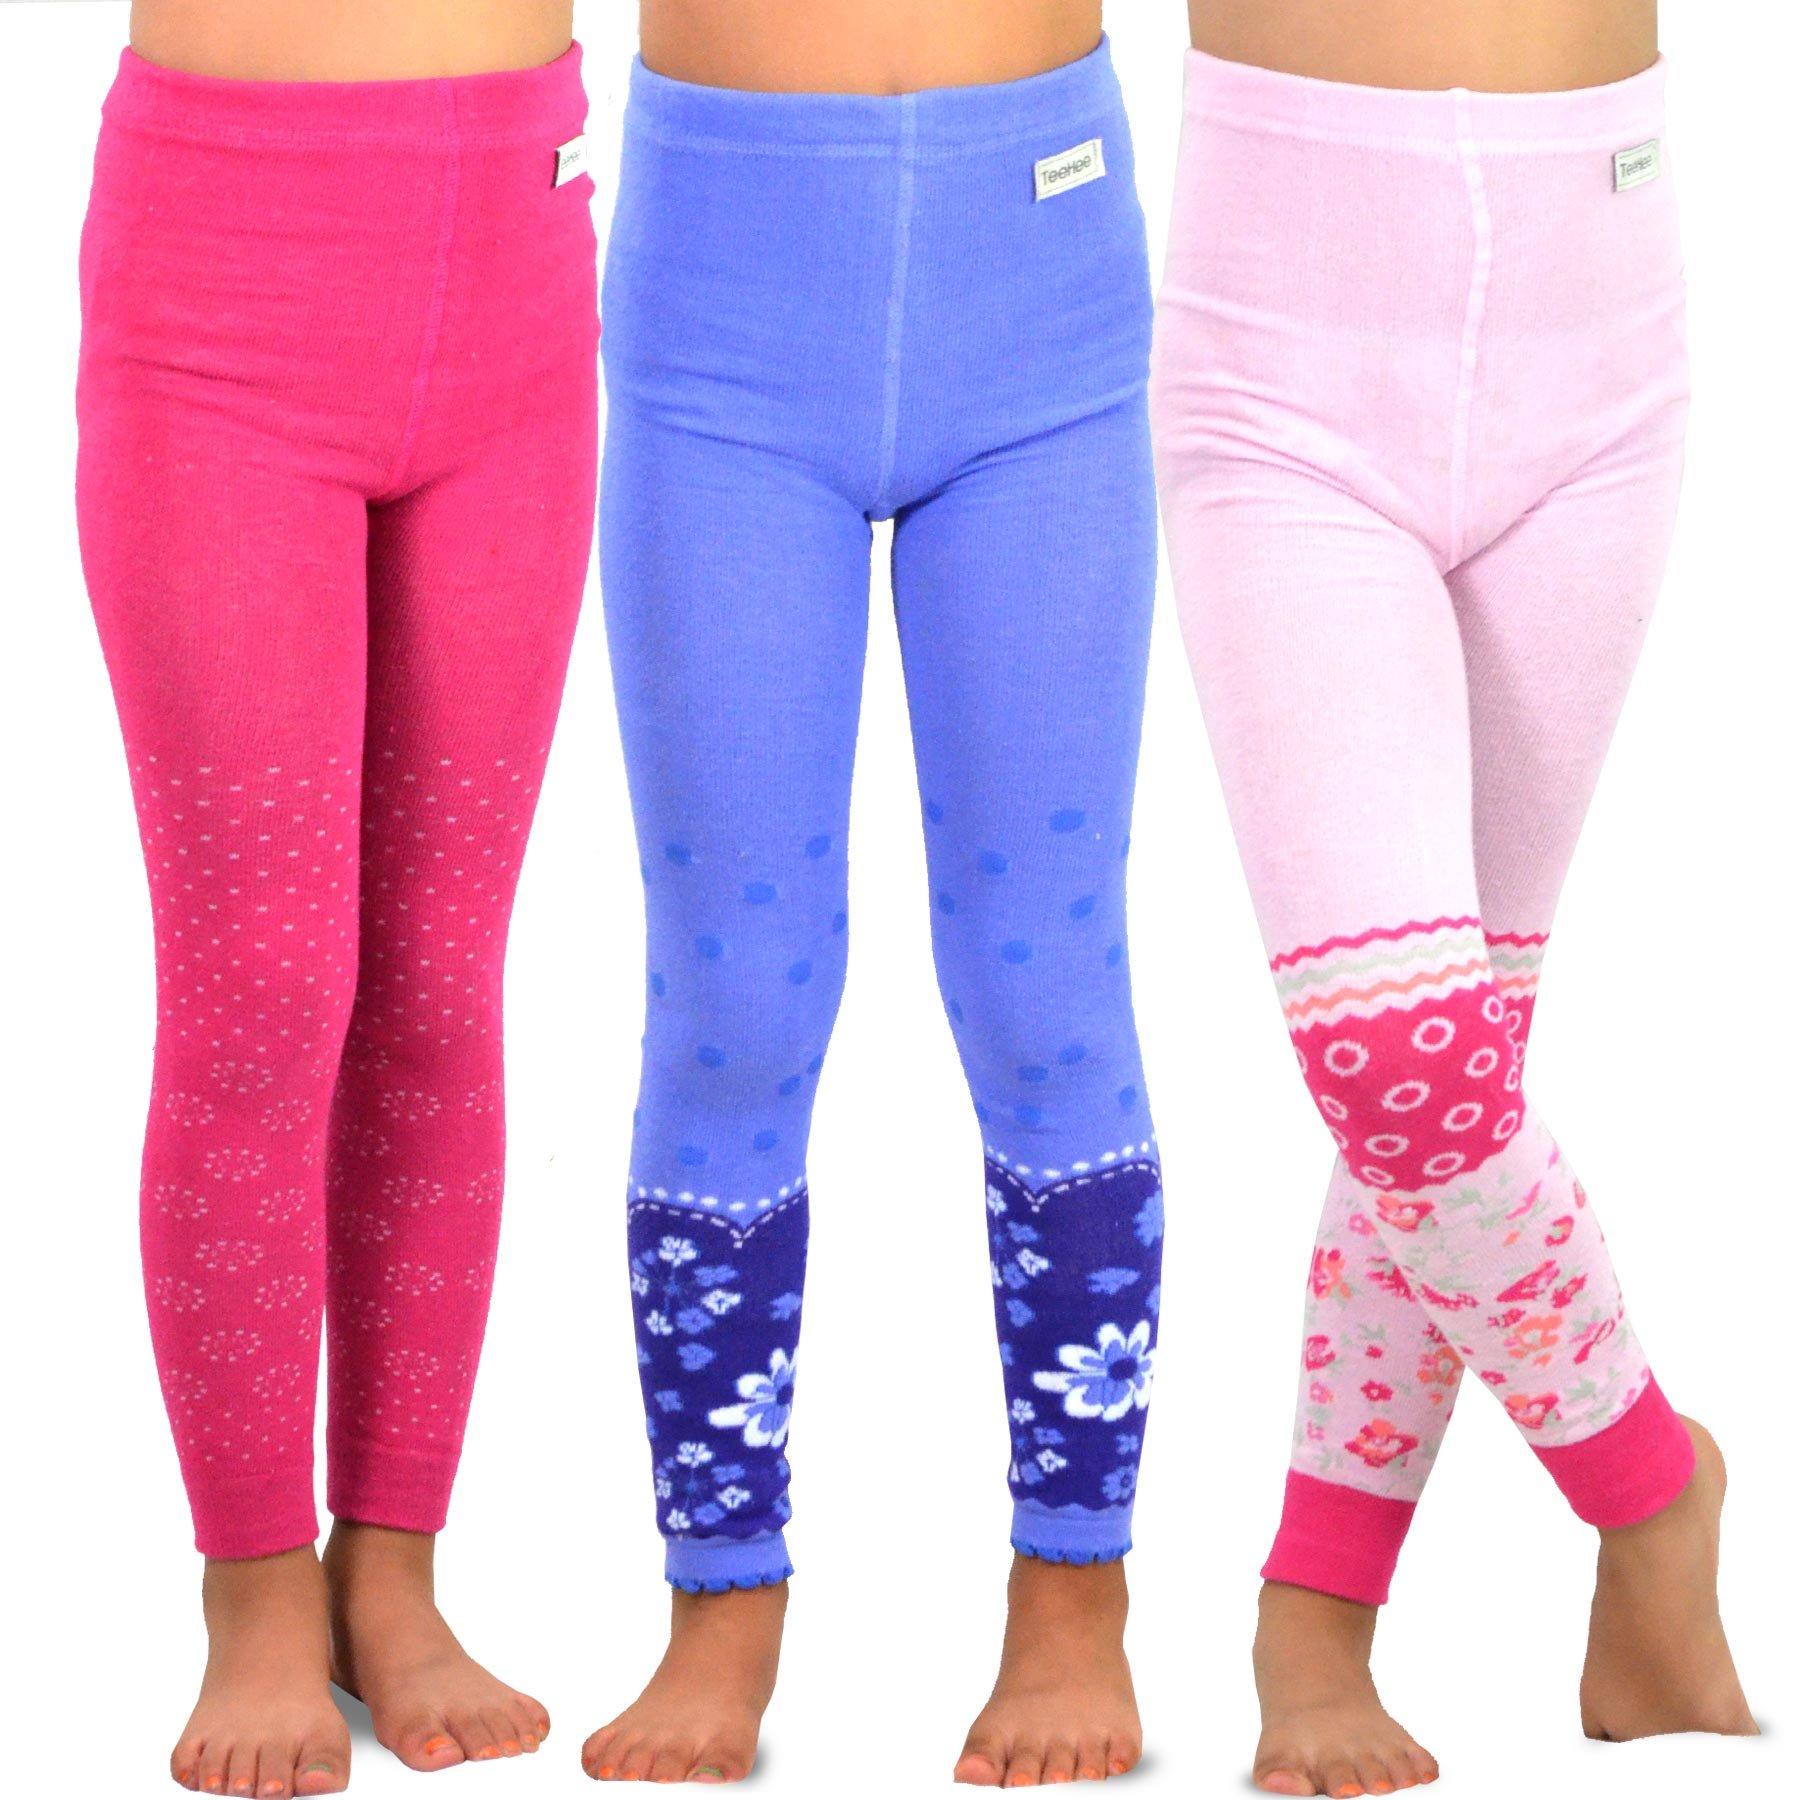 TeeHee Kids Girls Fashion Cotton Leggings(Footless Tights) 3 Pair Pack (6-8 Years, Assort Floral)